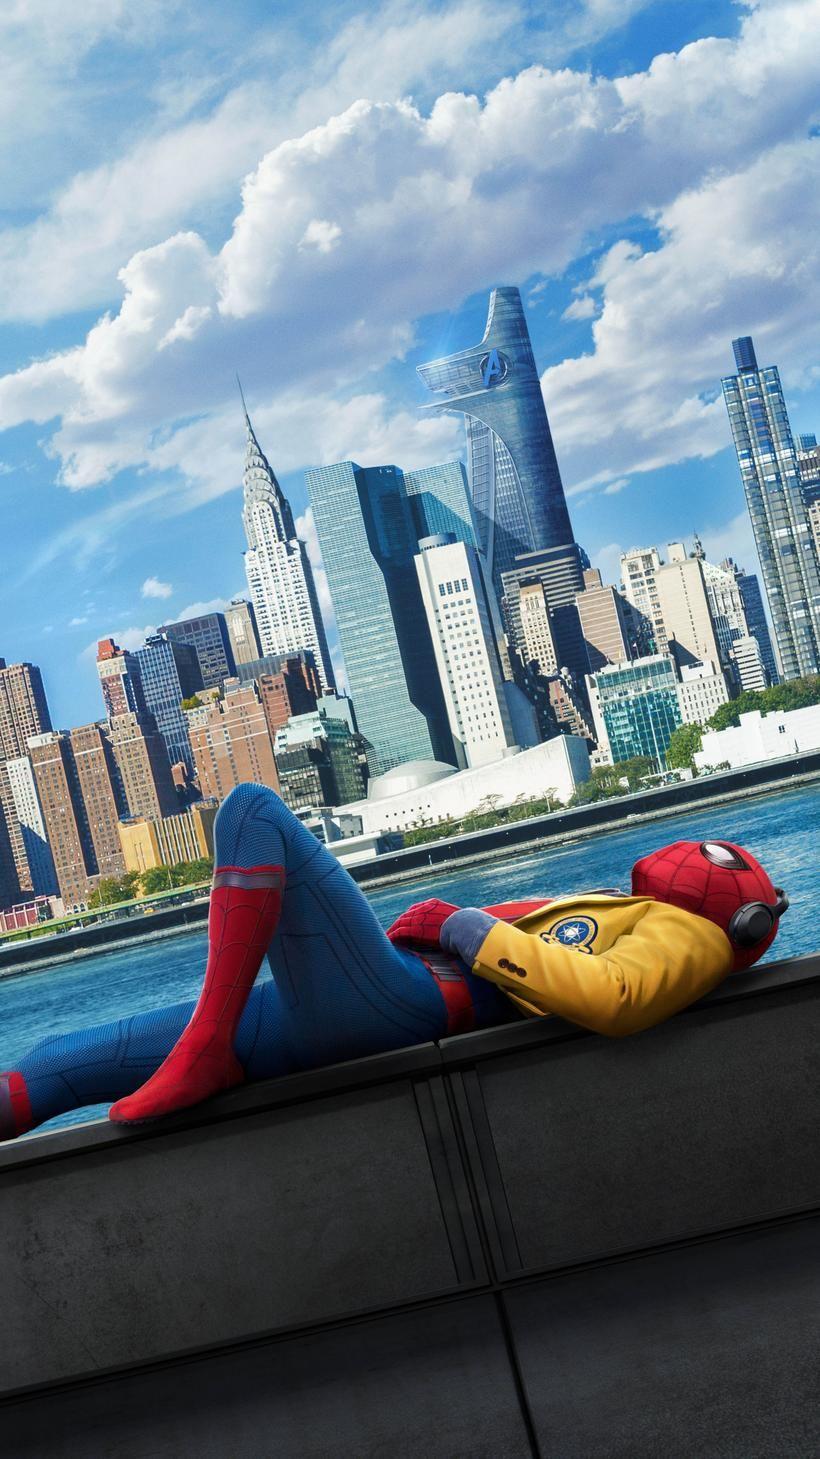 Spider Man Homecoming 2017 Phone Wallpaper Stuff Pozad v 820x1459